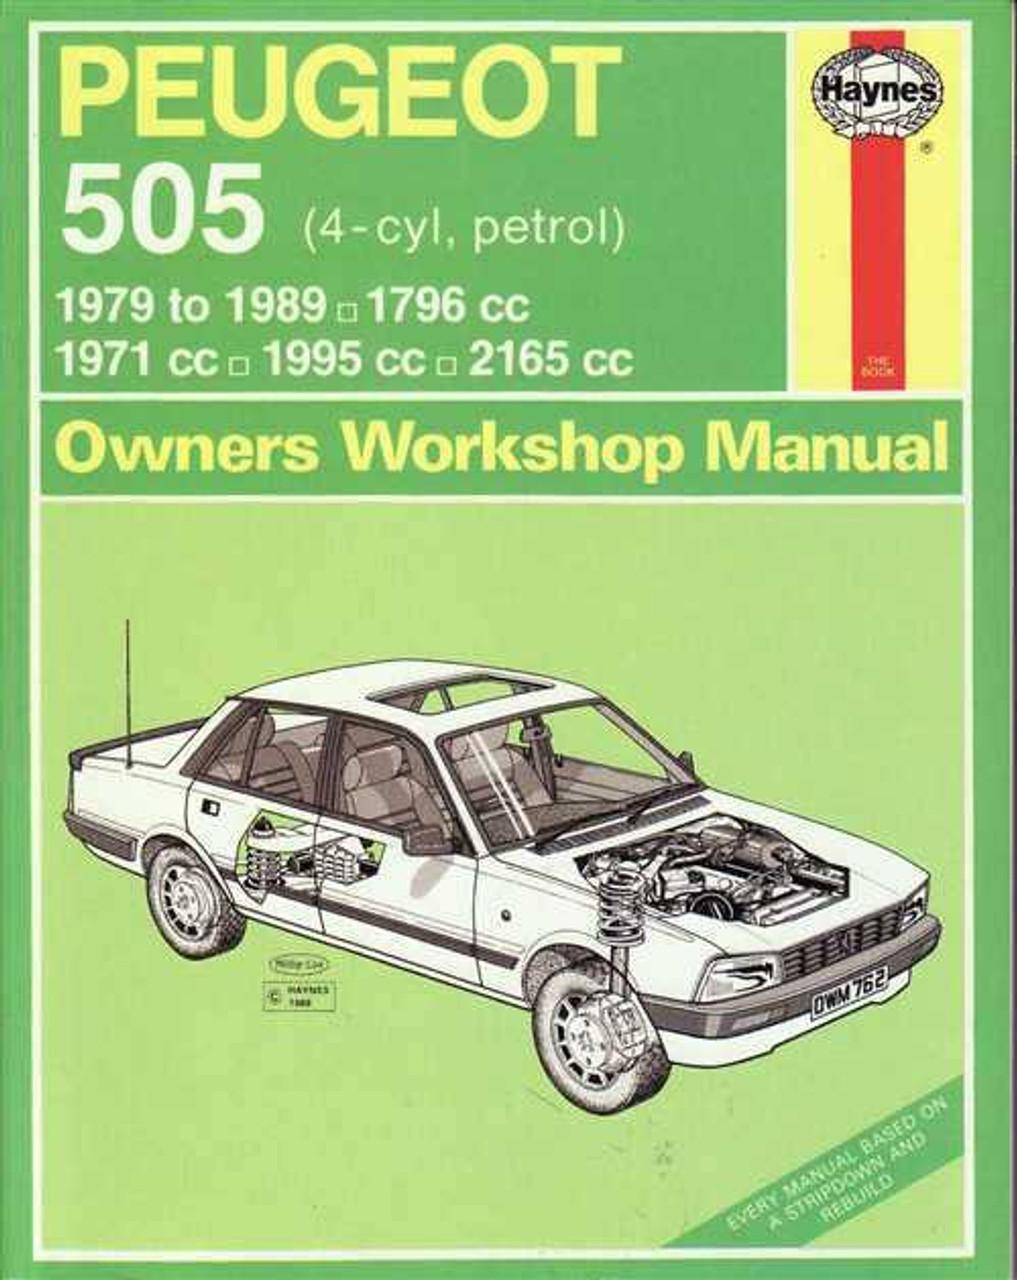 peugeot 505 1971 1995 workshop manual rh automotobookshop com au Peugeot 505 Wagon 1986 Peugeot 505 Turbo